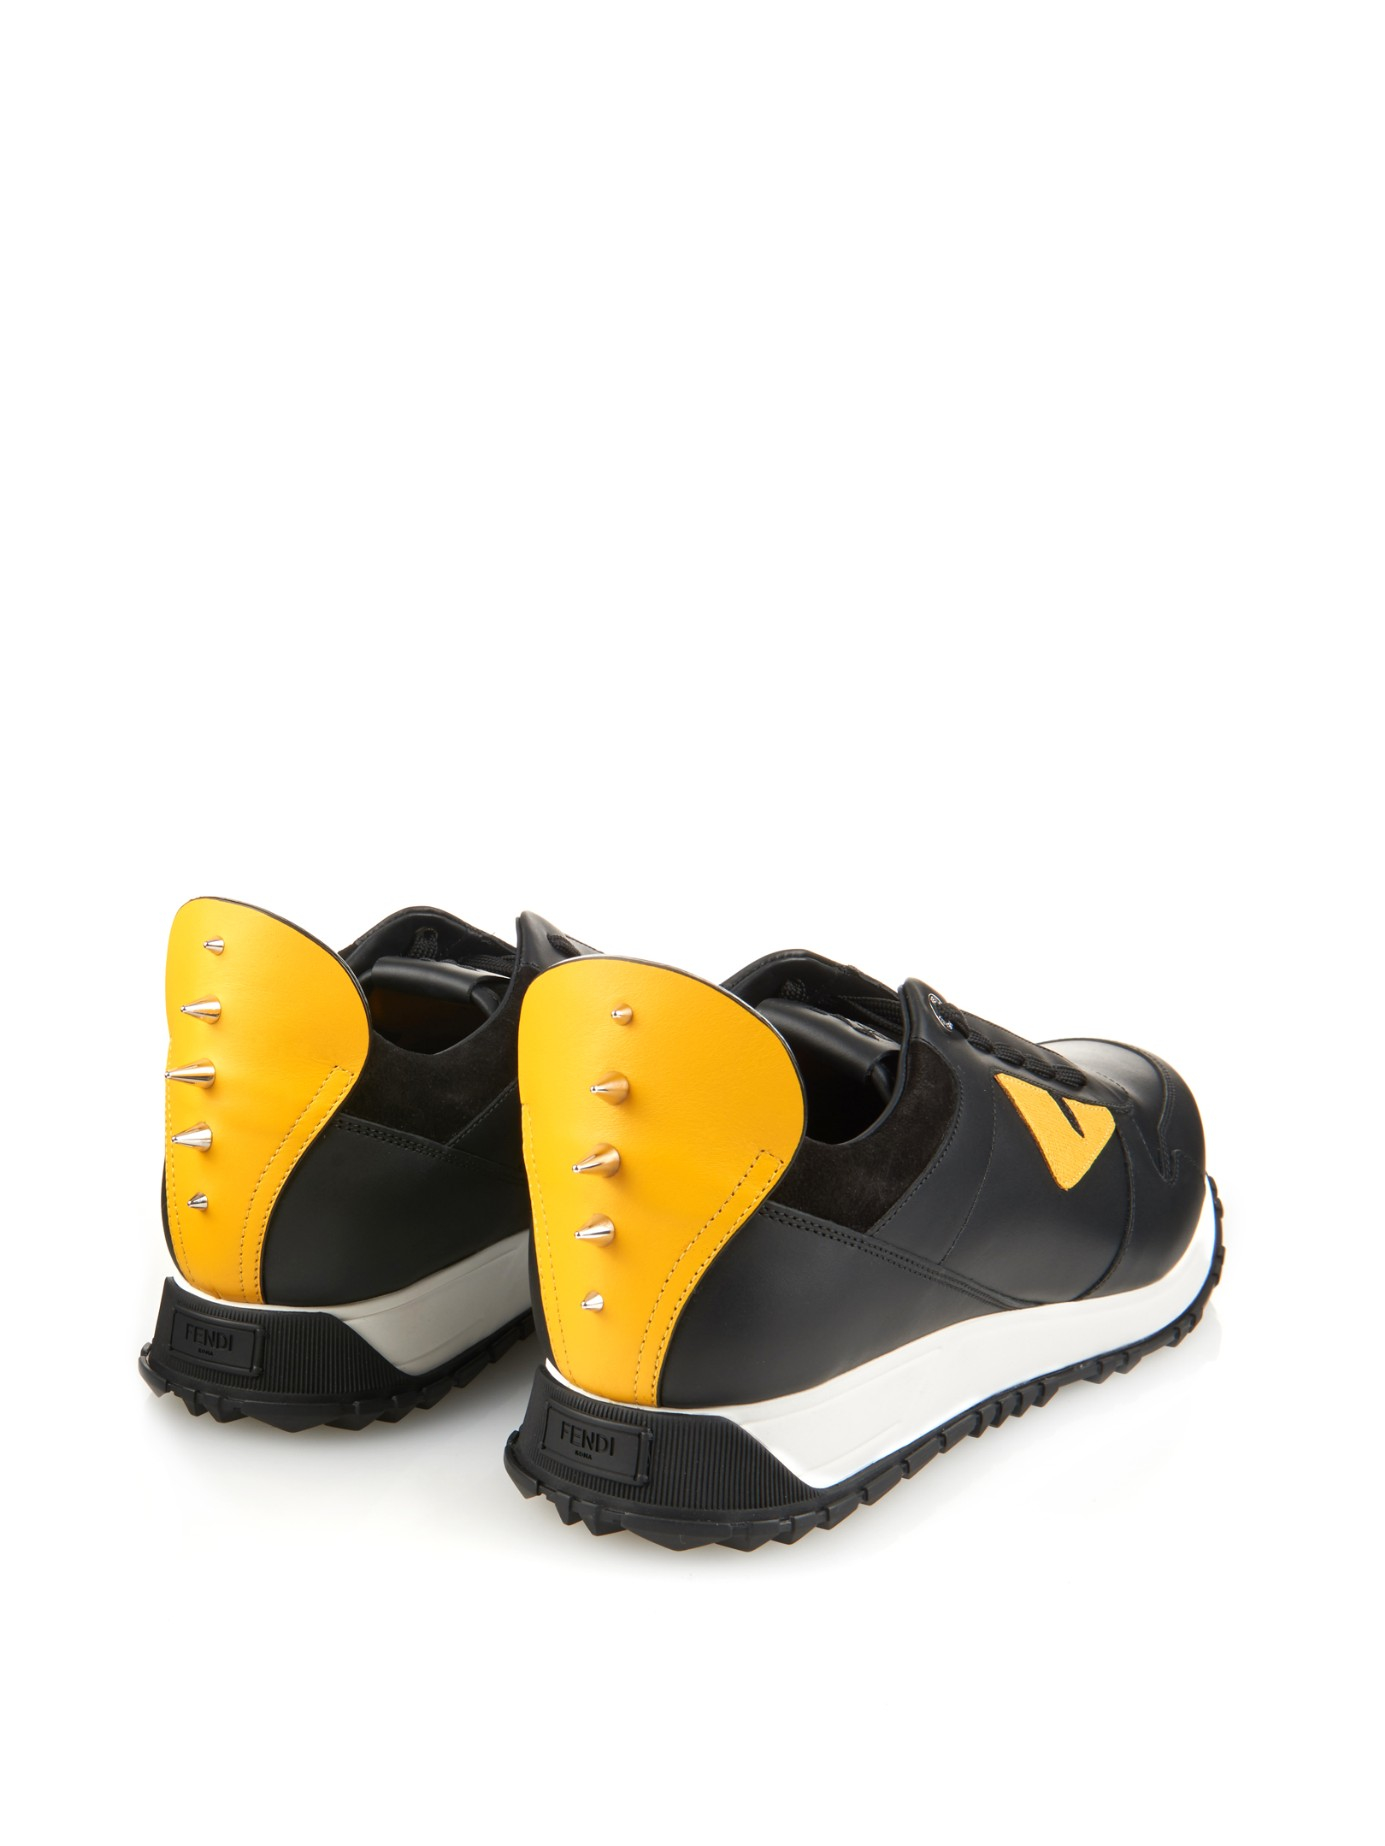 Bugs Sac Fendi Chaussures De Sport - Noir qitdA8HGF